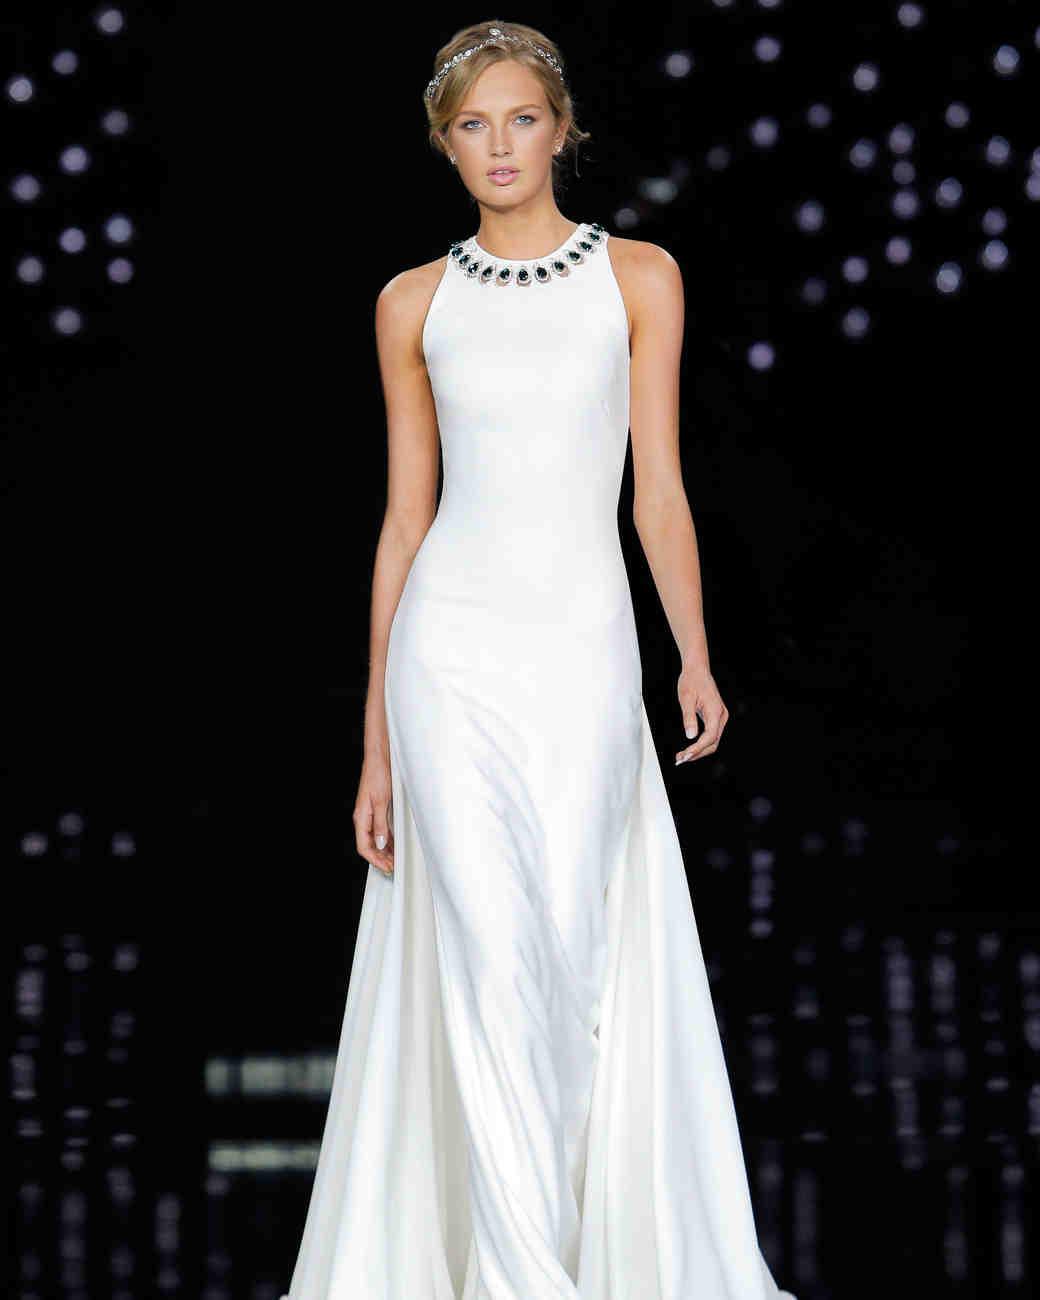 Get The Look Twiggy Inspired Wedding Dress